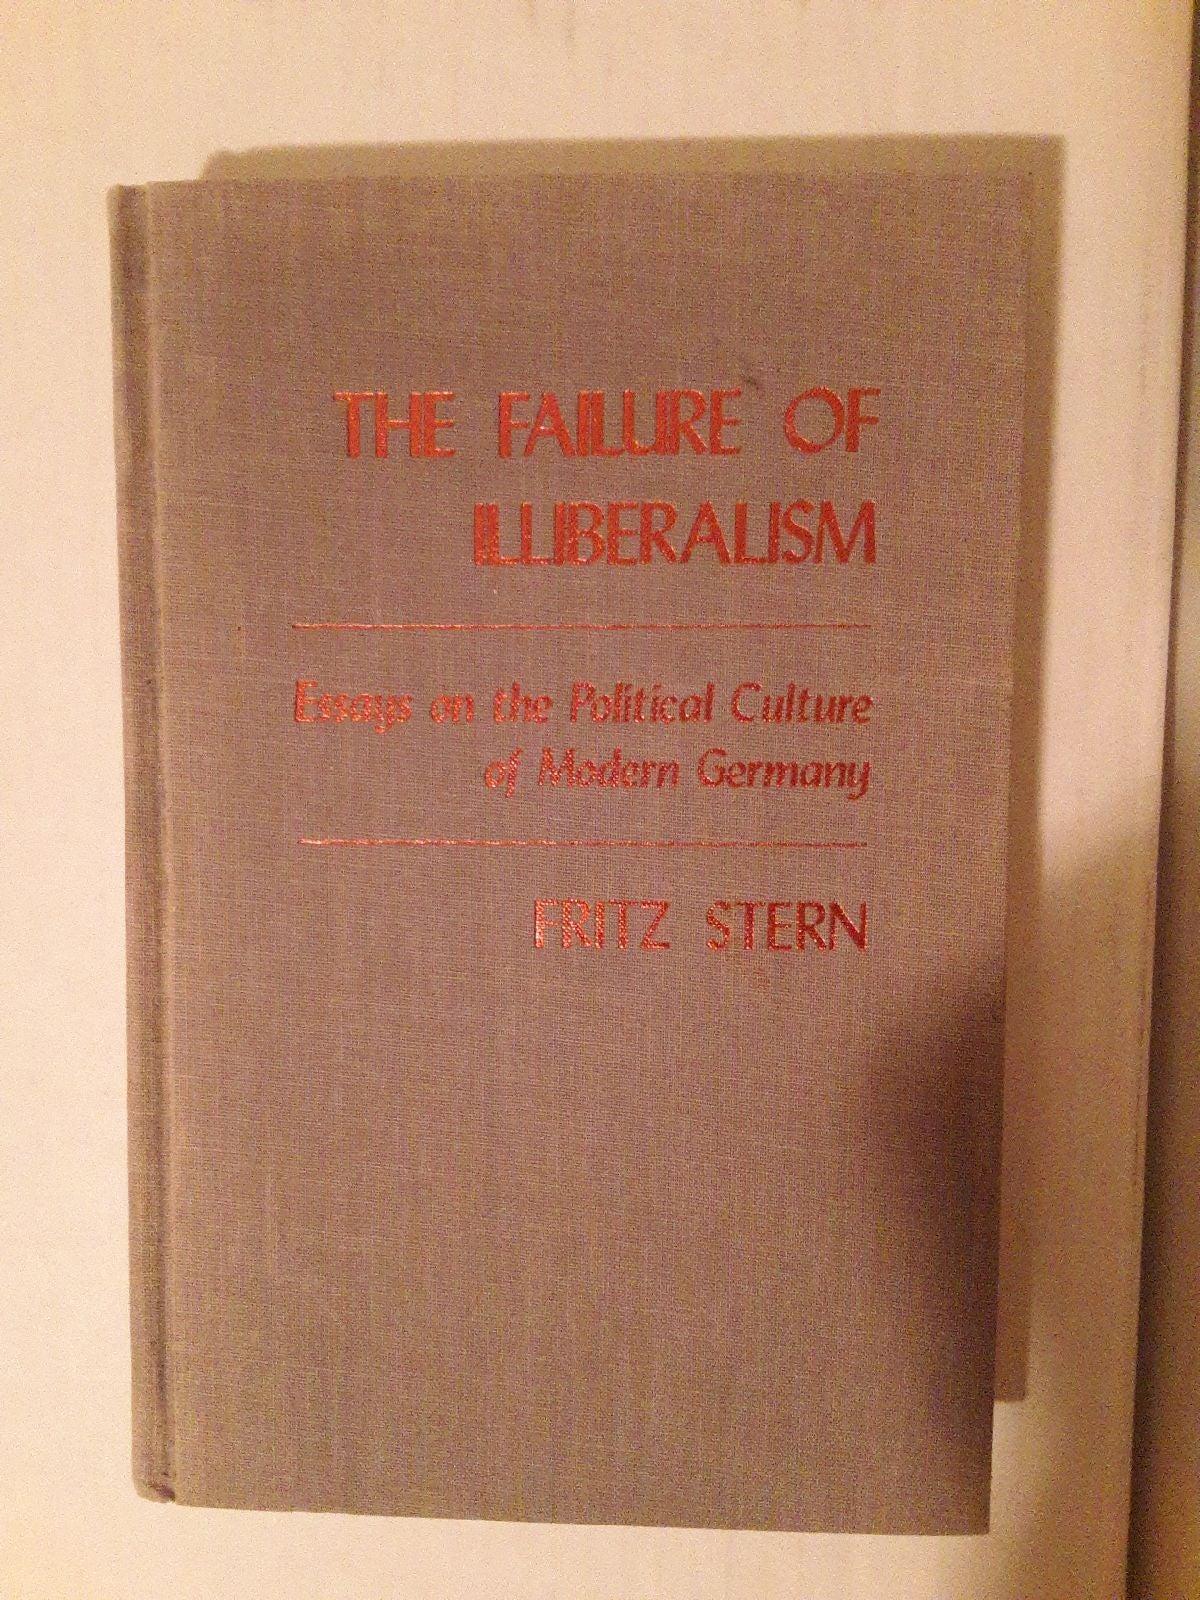 The Failure  of Illiberalism